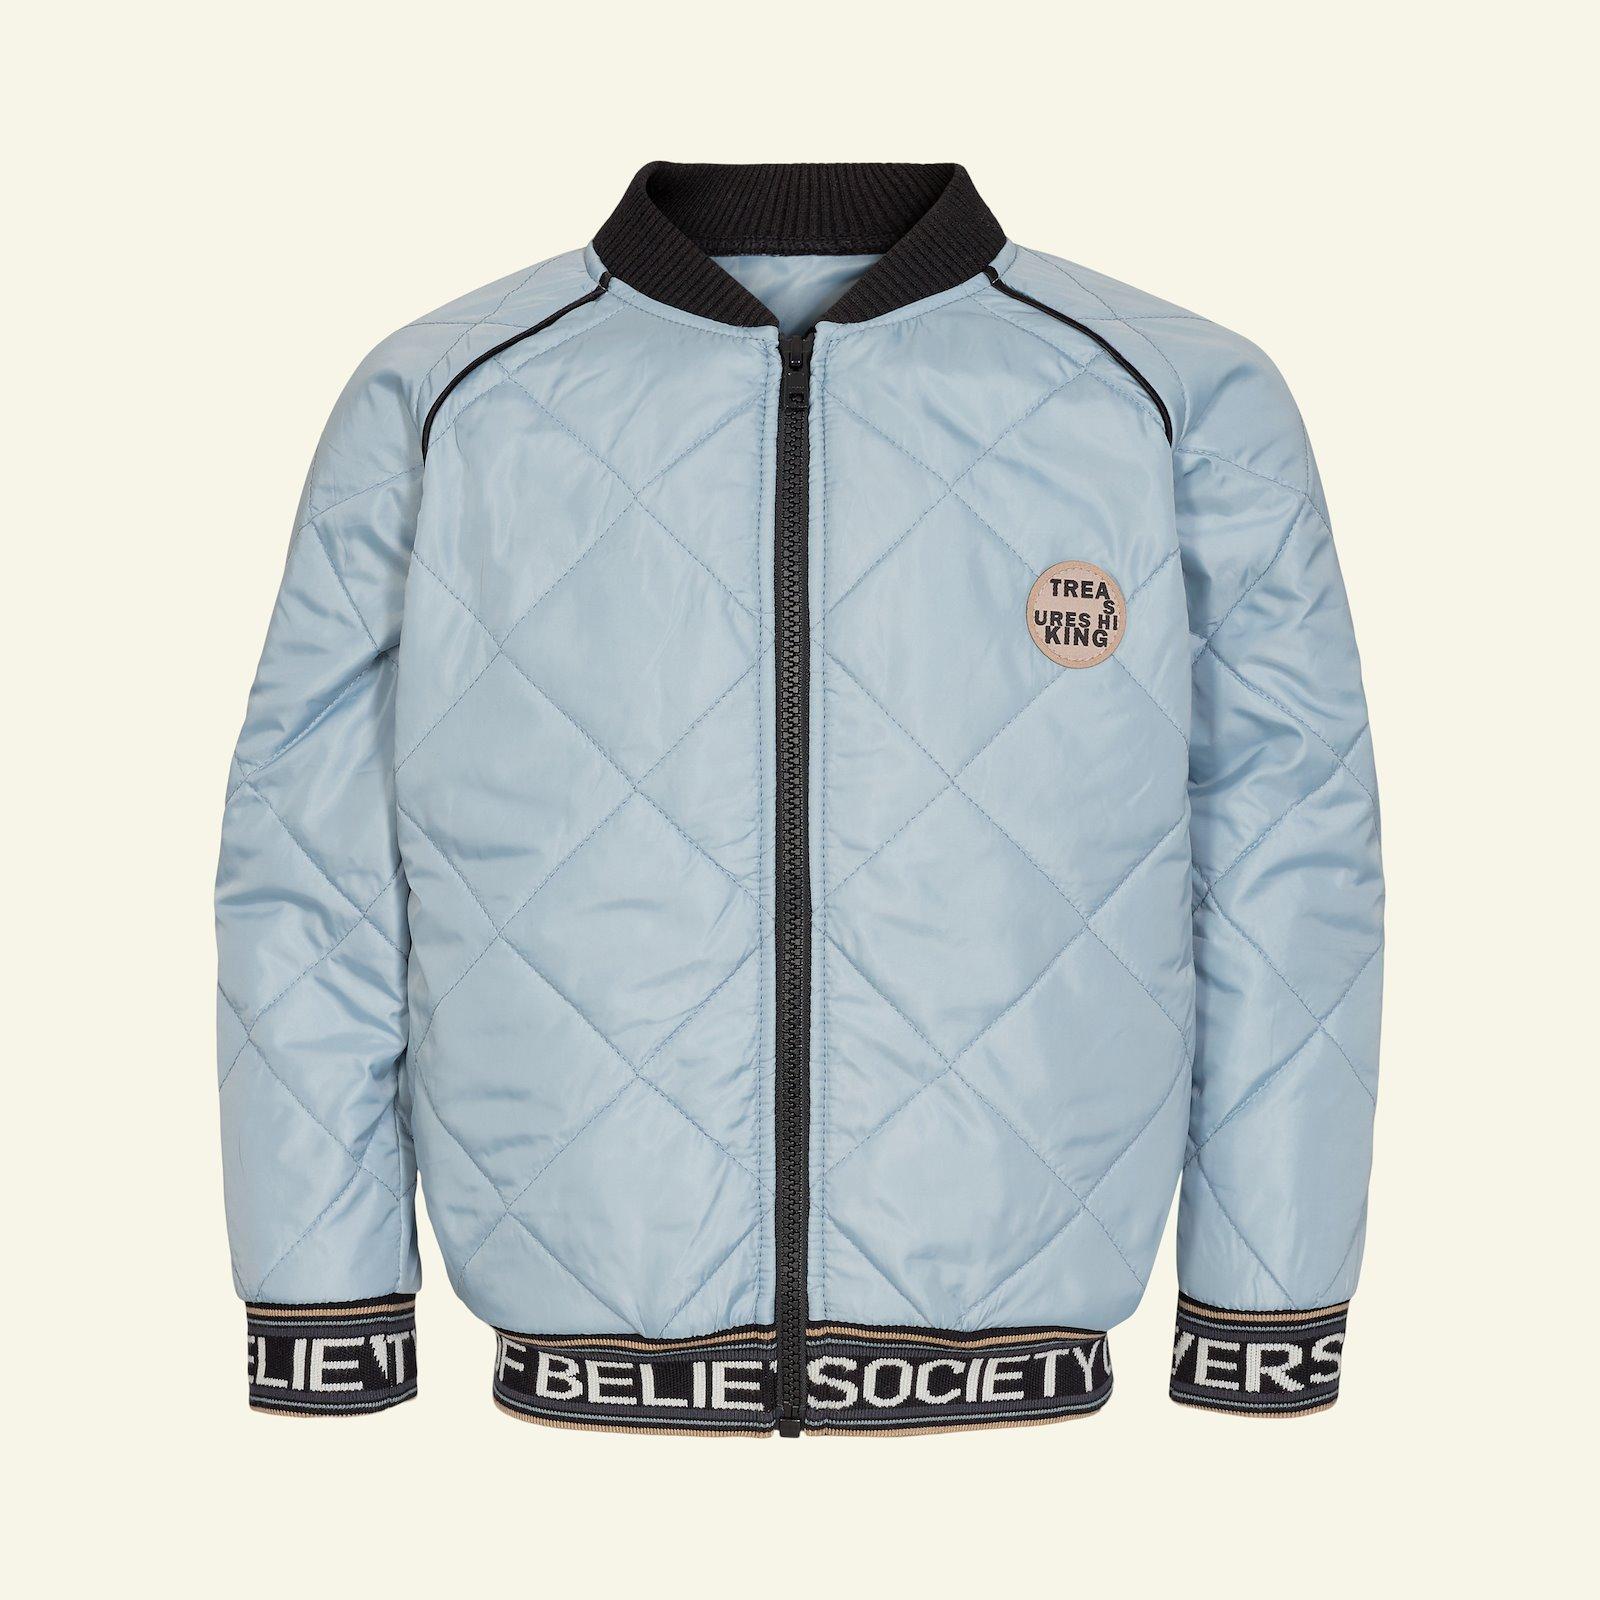 Bomber jacket, 164/14y p64017_920225_3509089_72043_26519_sskit